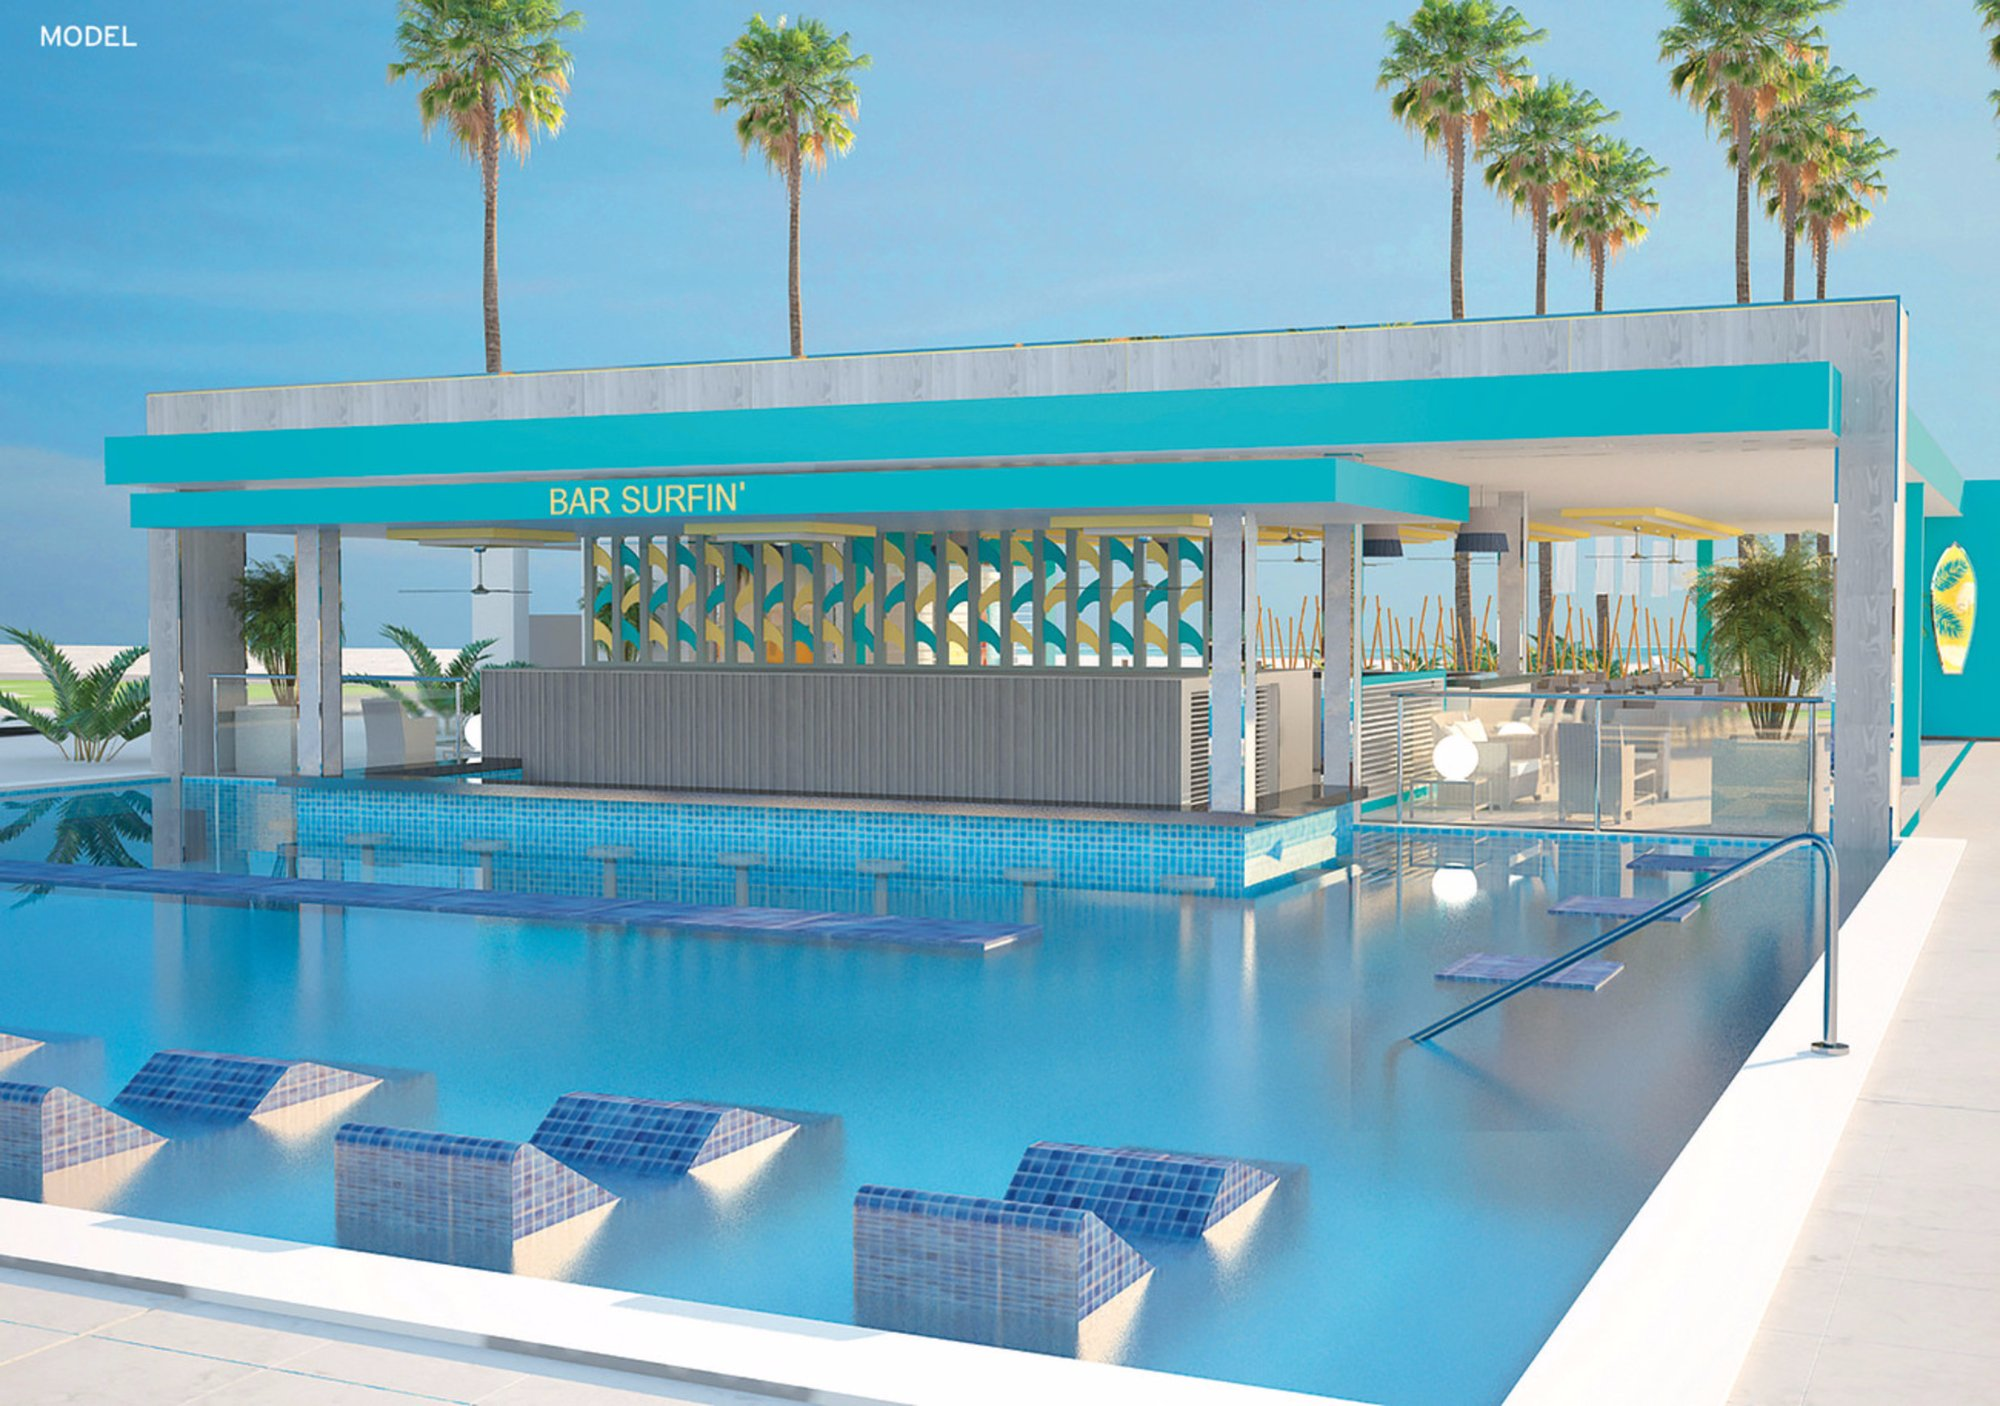 Clubhotel Riu Bambu Updated 2017 Reviews Photos Amp Price Comparison Punta Cana Dominican